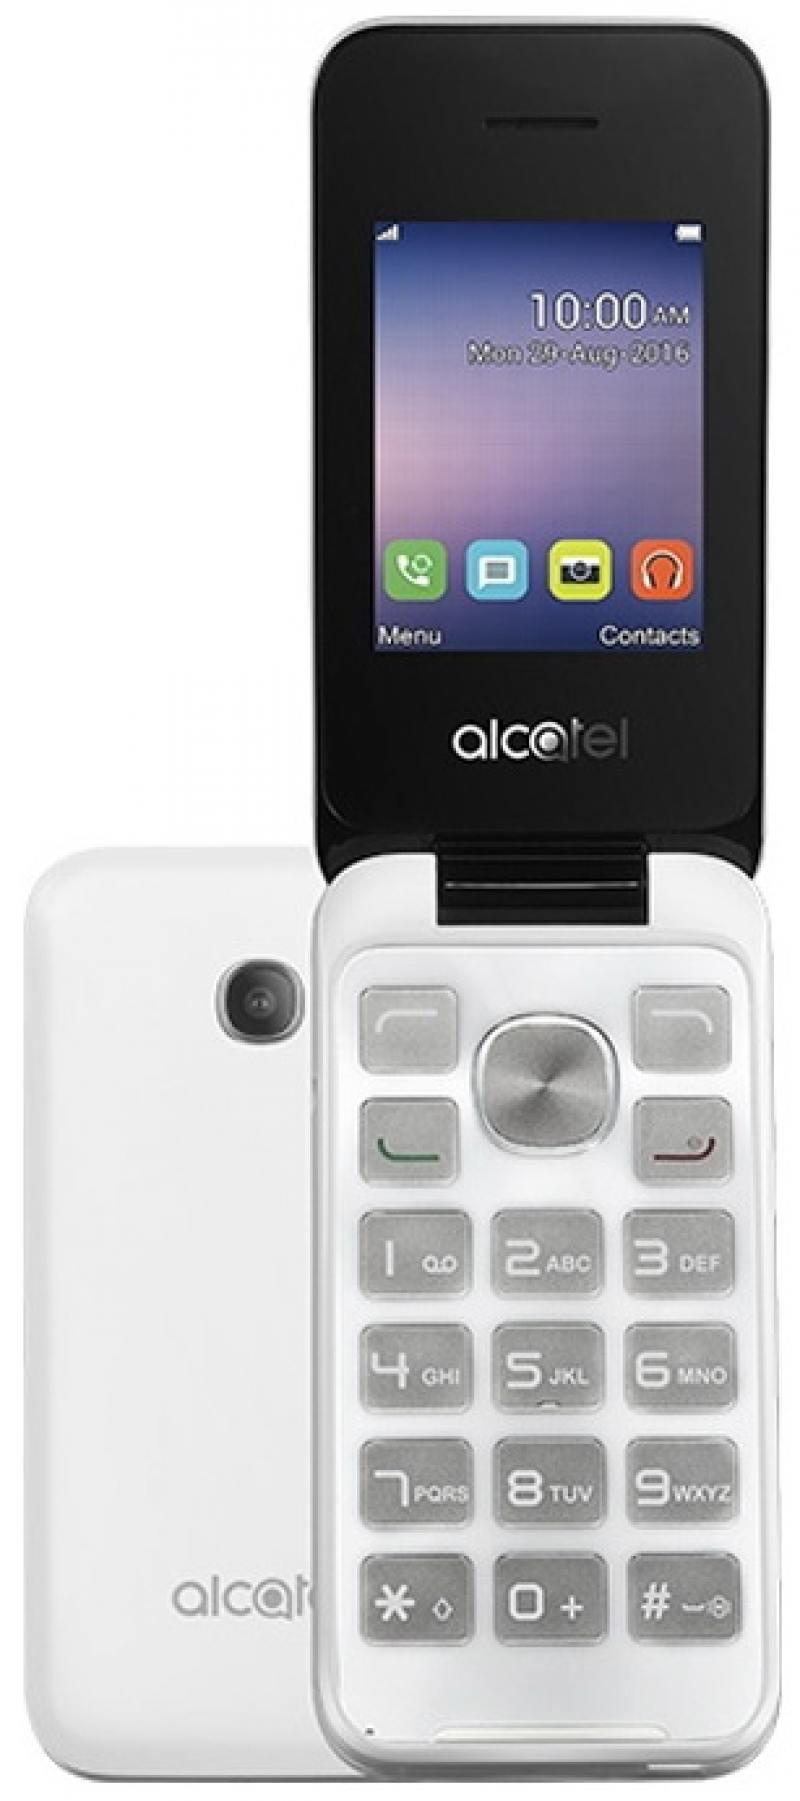 Мобильный телефон Alcatel OneTouch 2051D белый 2.4 аксессуар защитная пленка alcatel onetouch idol alpha media gadget premium прозрачная mg986